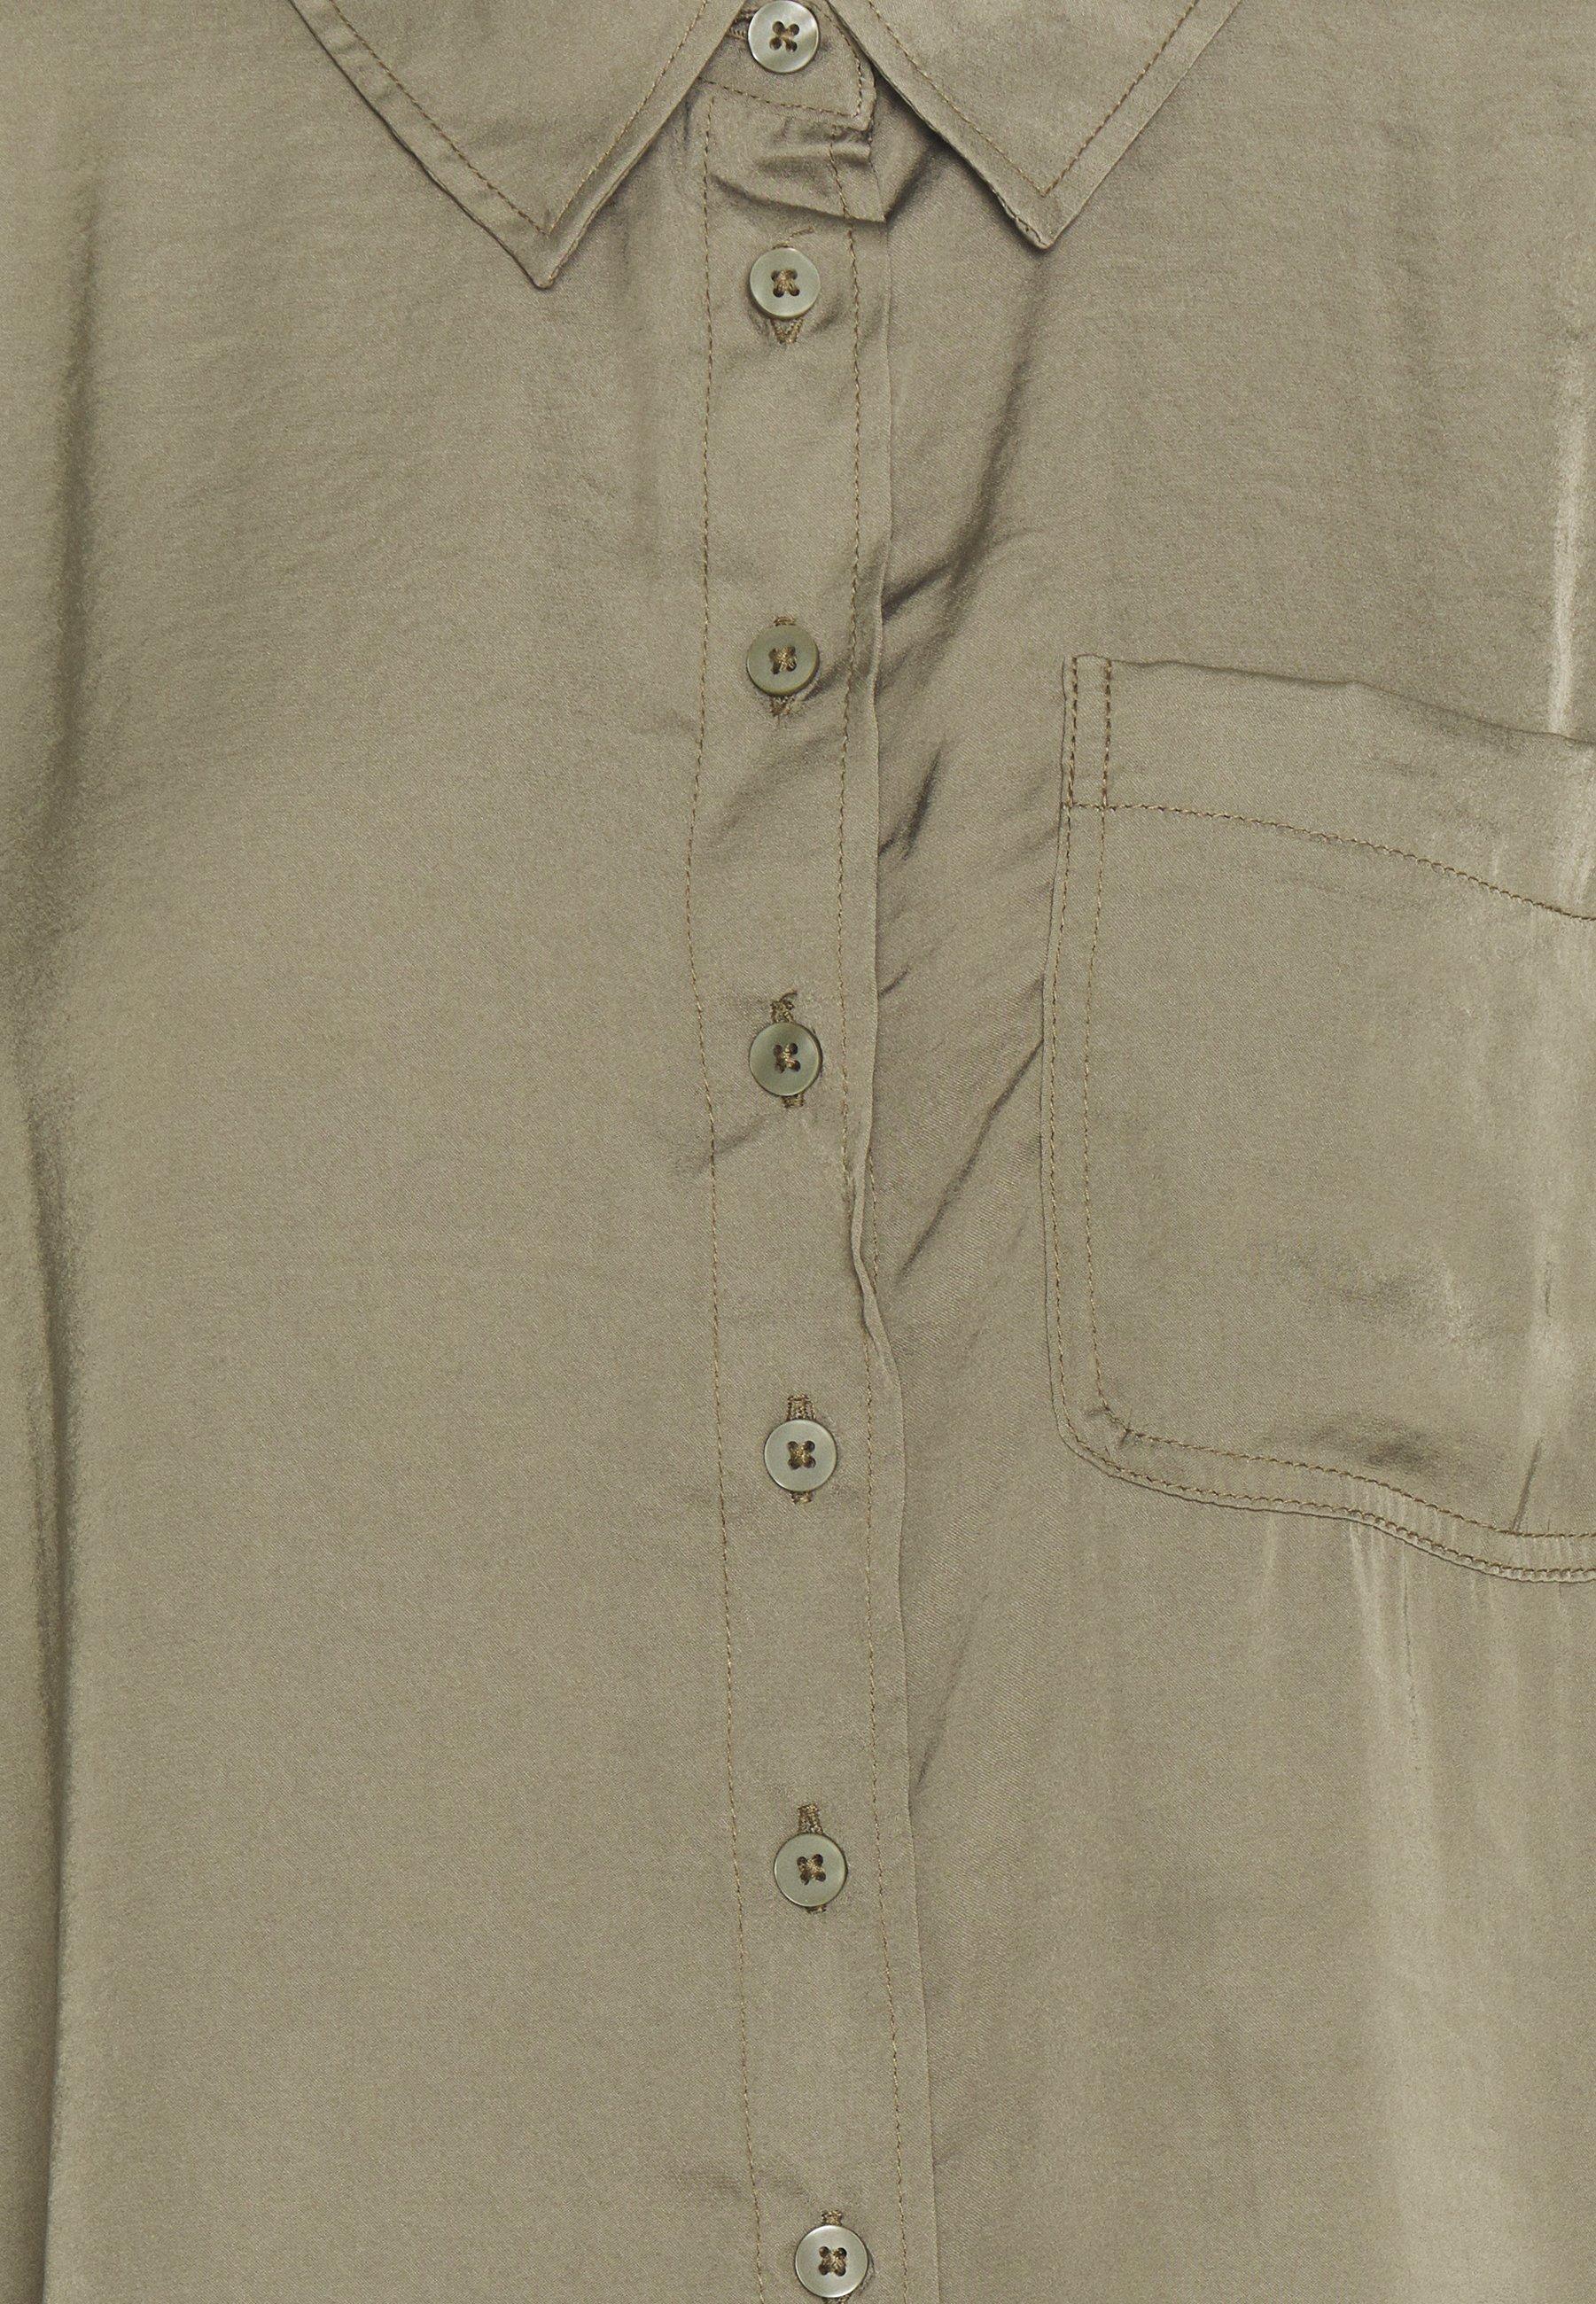 American Eagle CORE SILKY - Overhemdblouse - olive - Dameskleding Klassiek